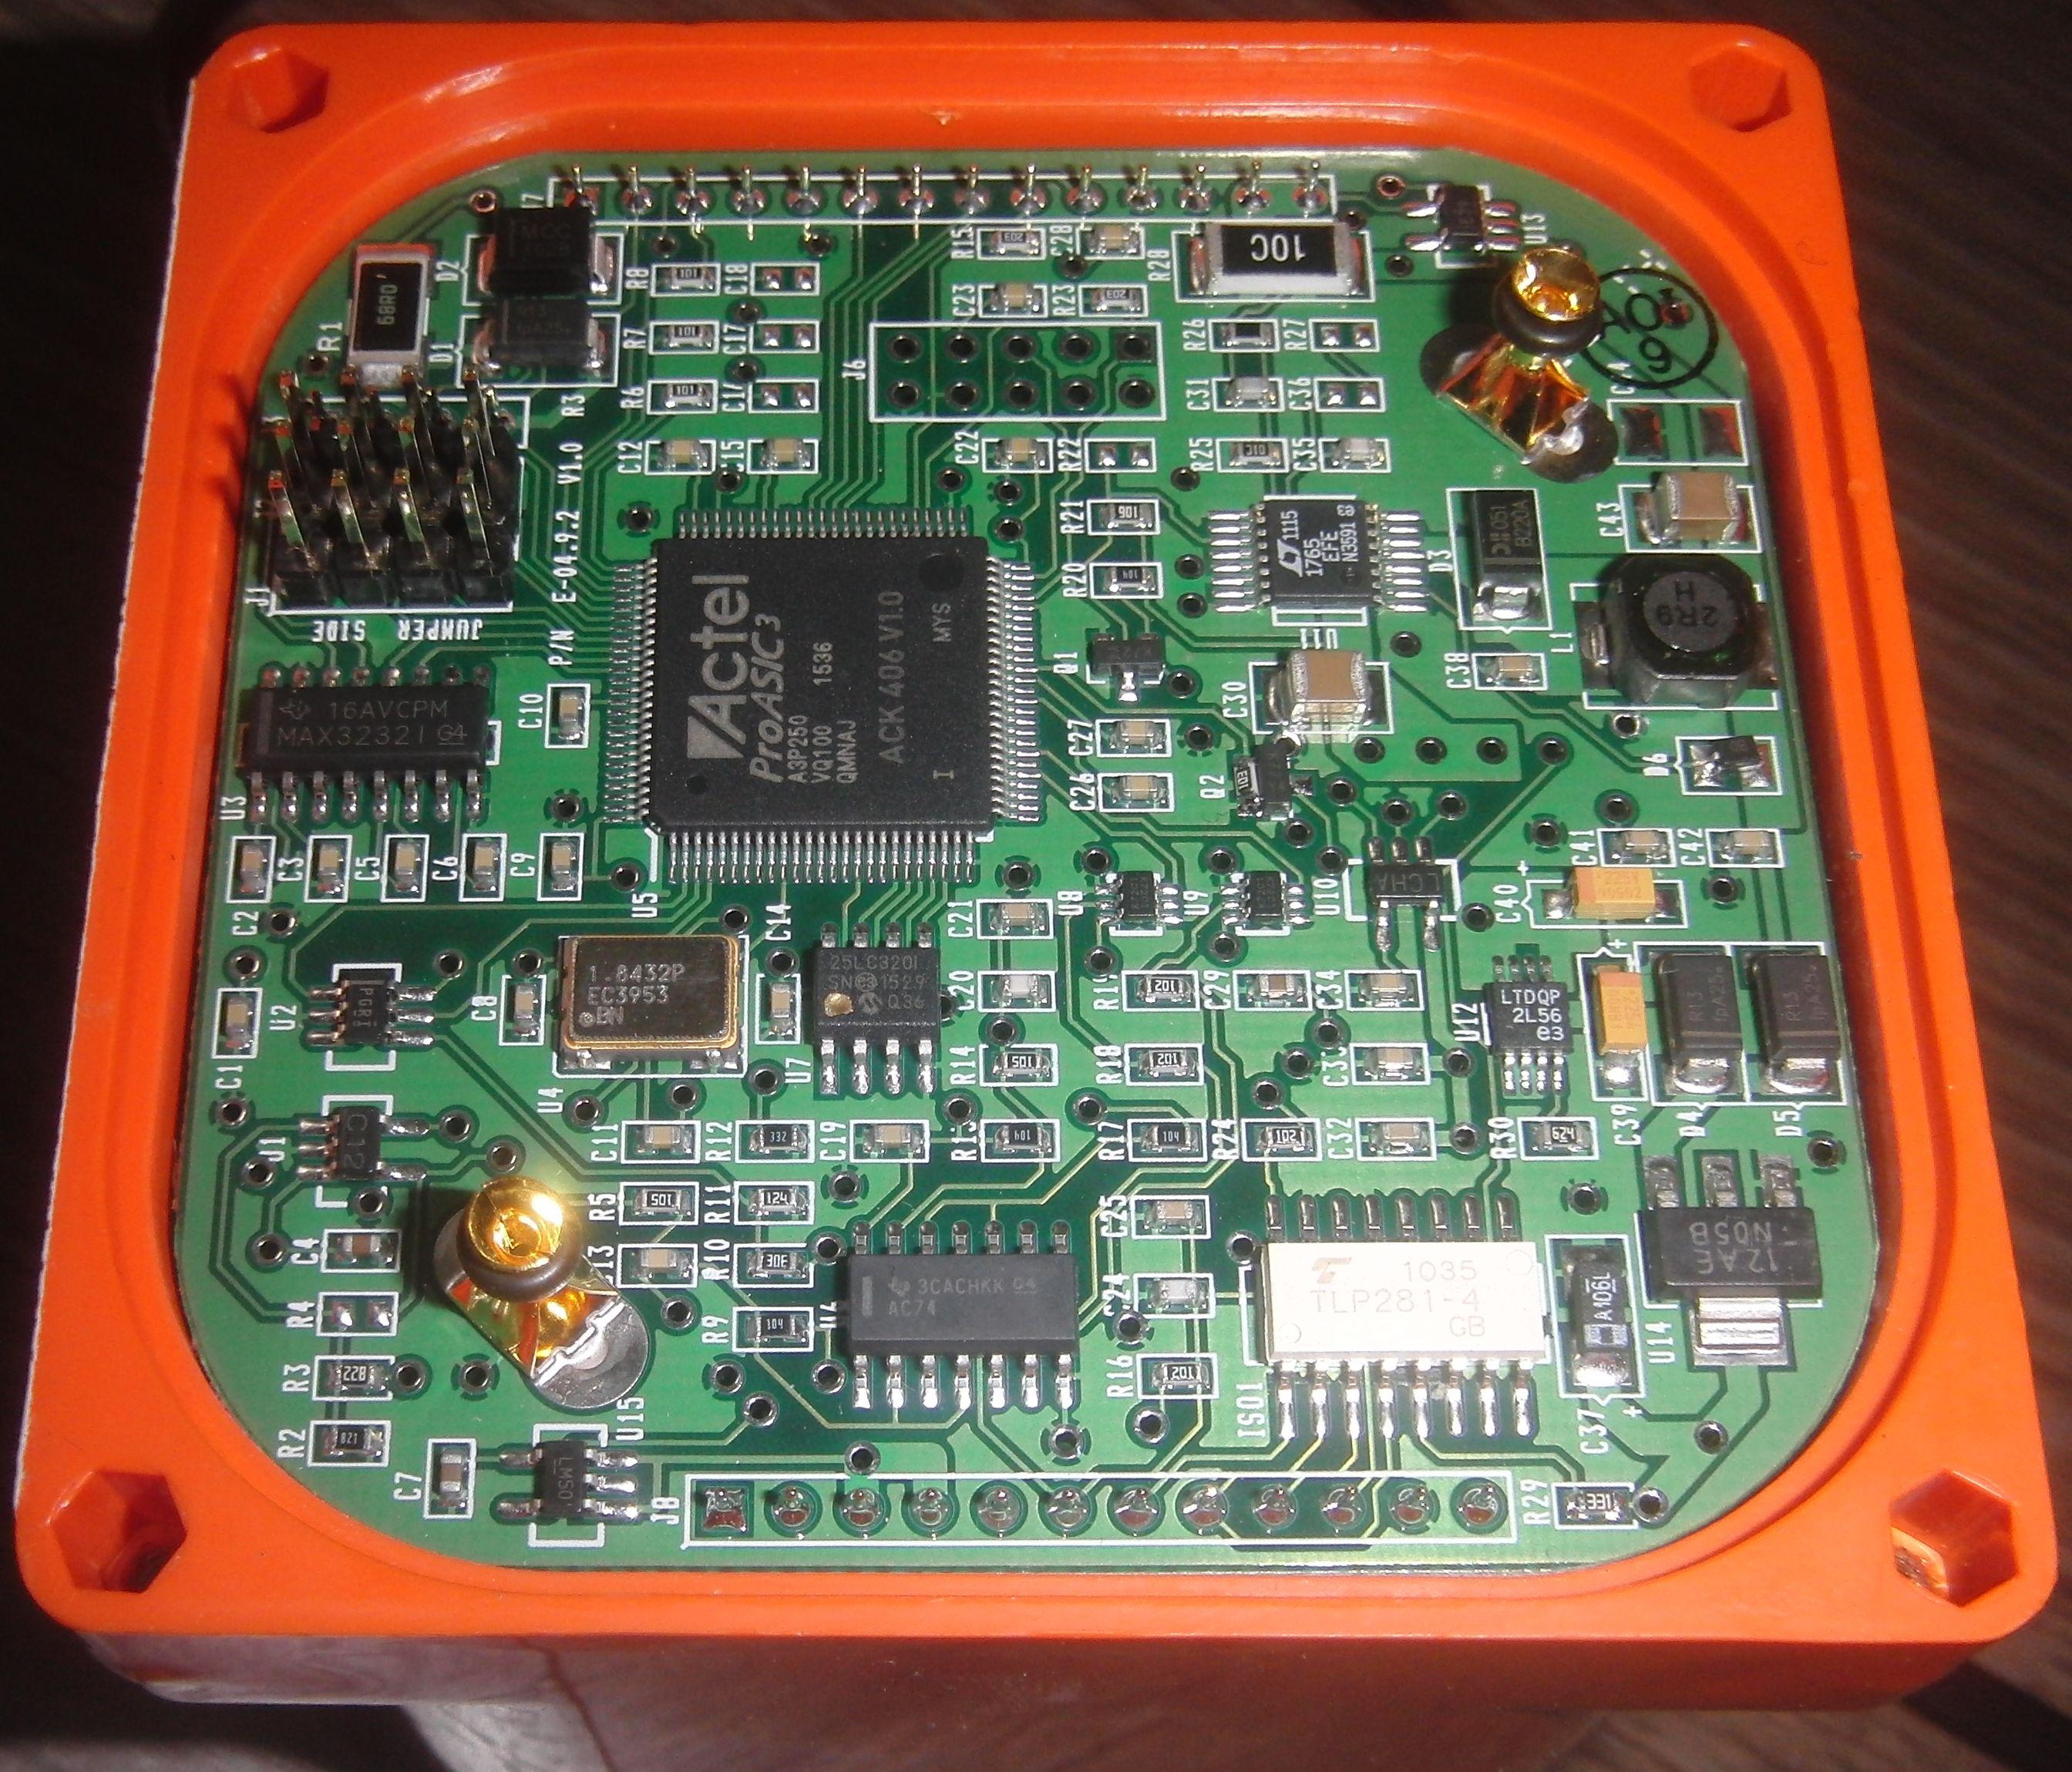 Радиомаяк ACK E-04 со снятой крышкой